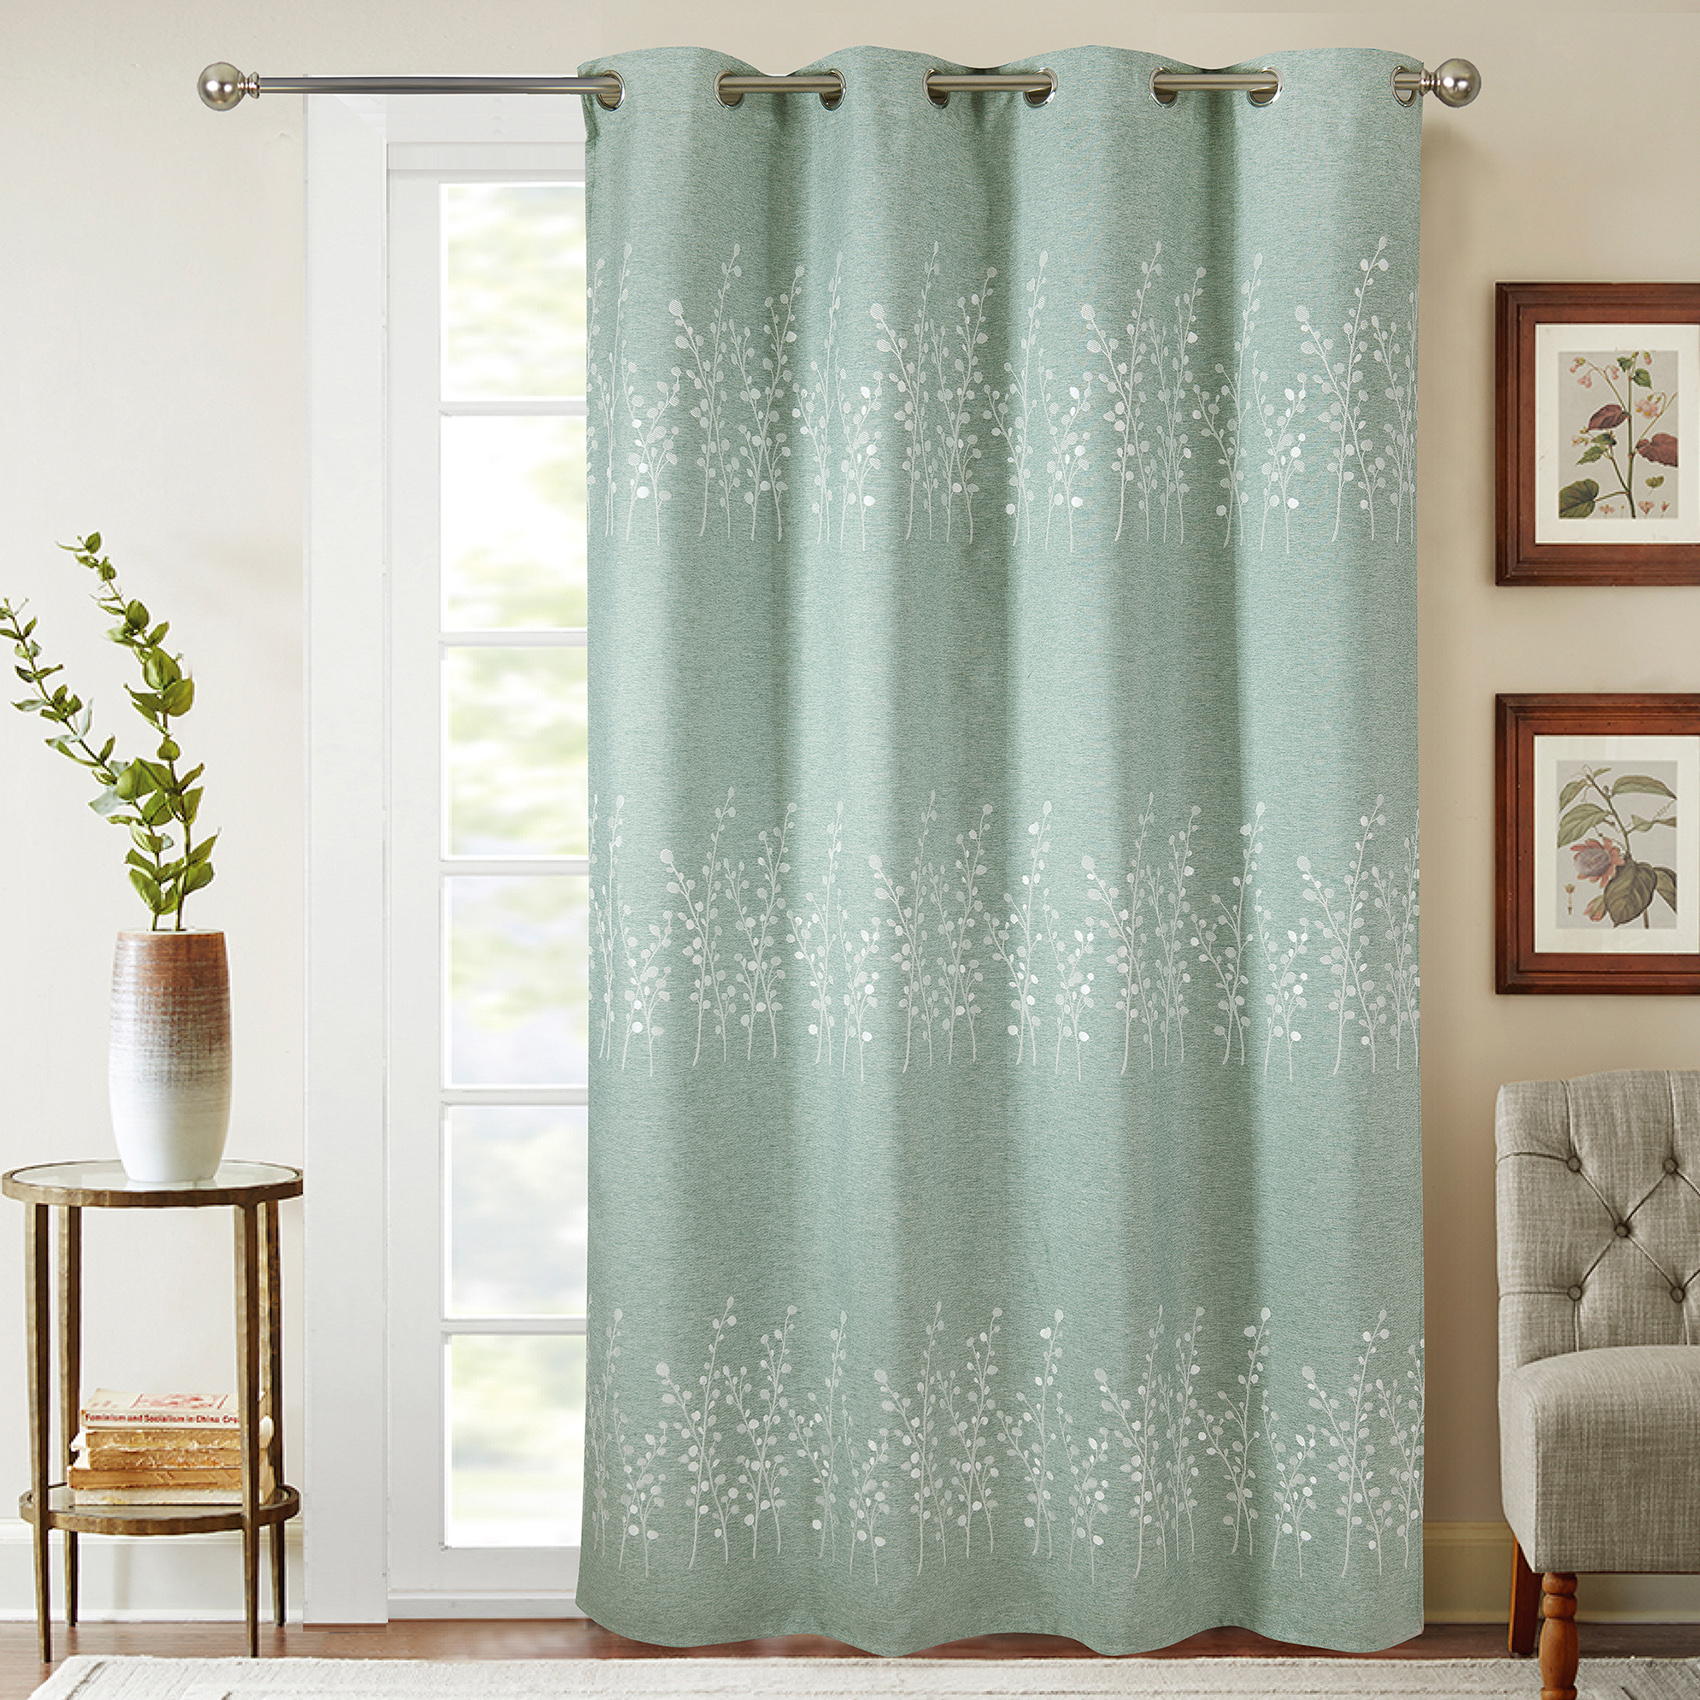 Rideaux occultant avec broderies végétales polyester vert 260x140